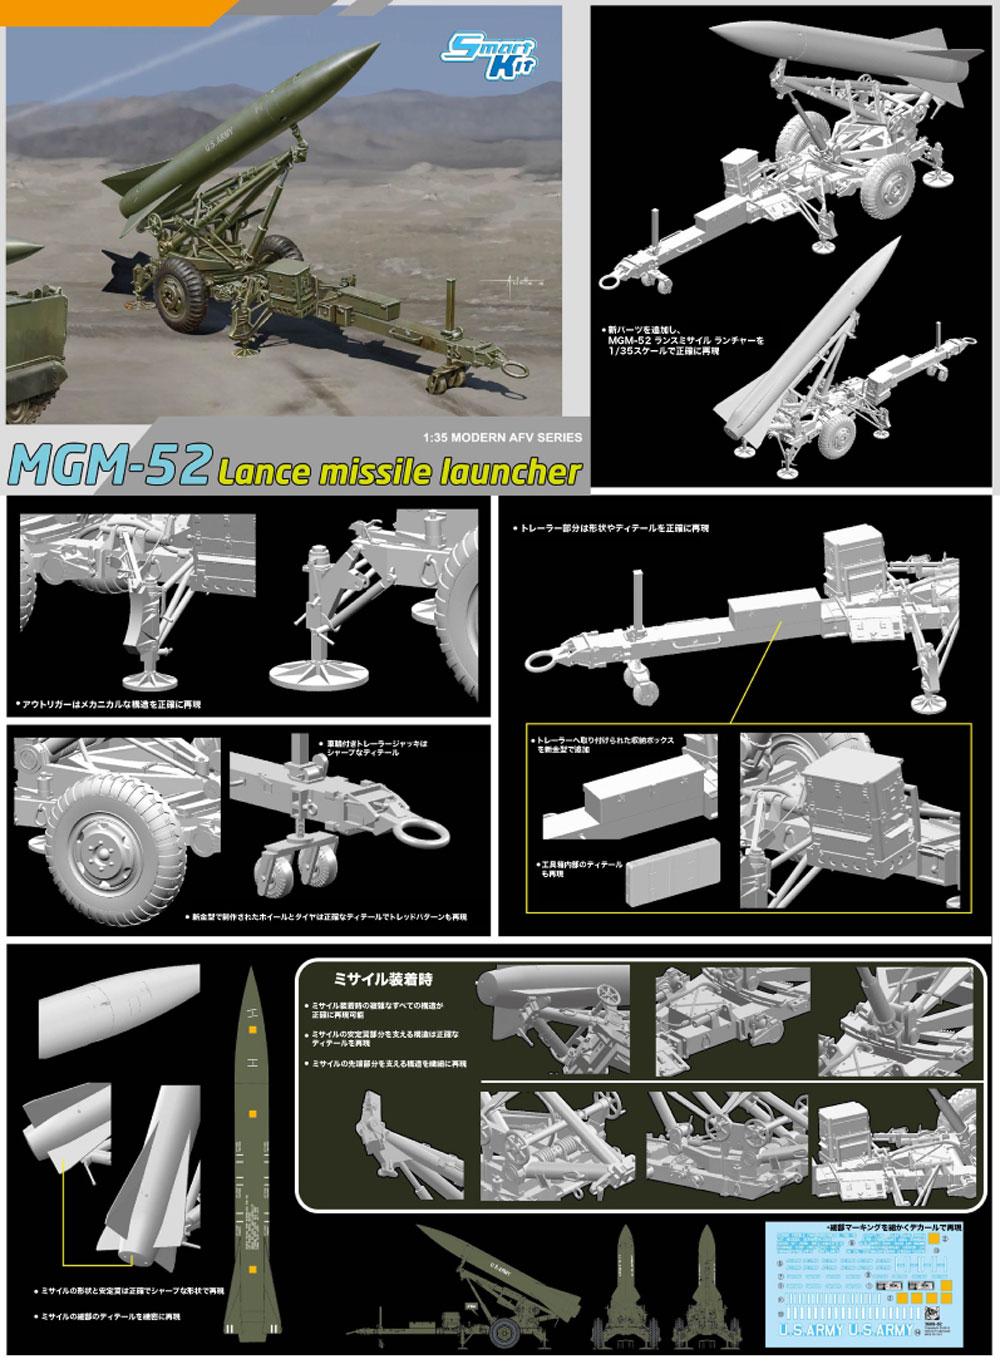 MGM-52 ランス ミサイル ランチャープラモデル(ドラゴン1/35 Modern AFV SeriesNo.3600)商品画像_4